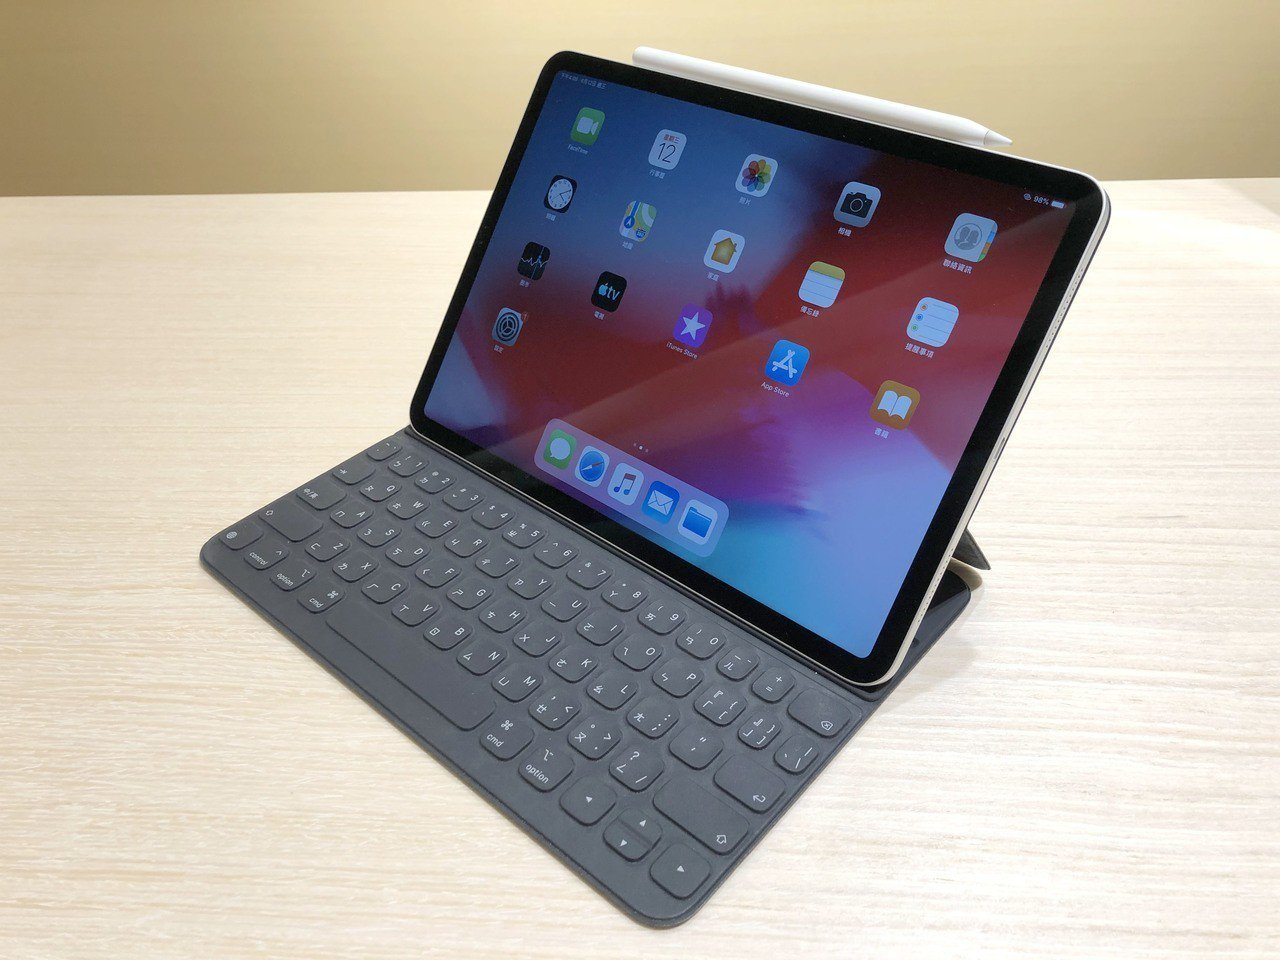 STUDIO A台中豐原太平洋門市6月14日開幕,iPad Pro 11吋Wi-...